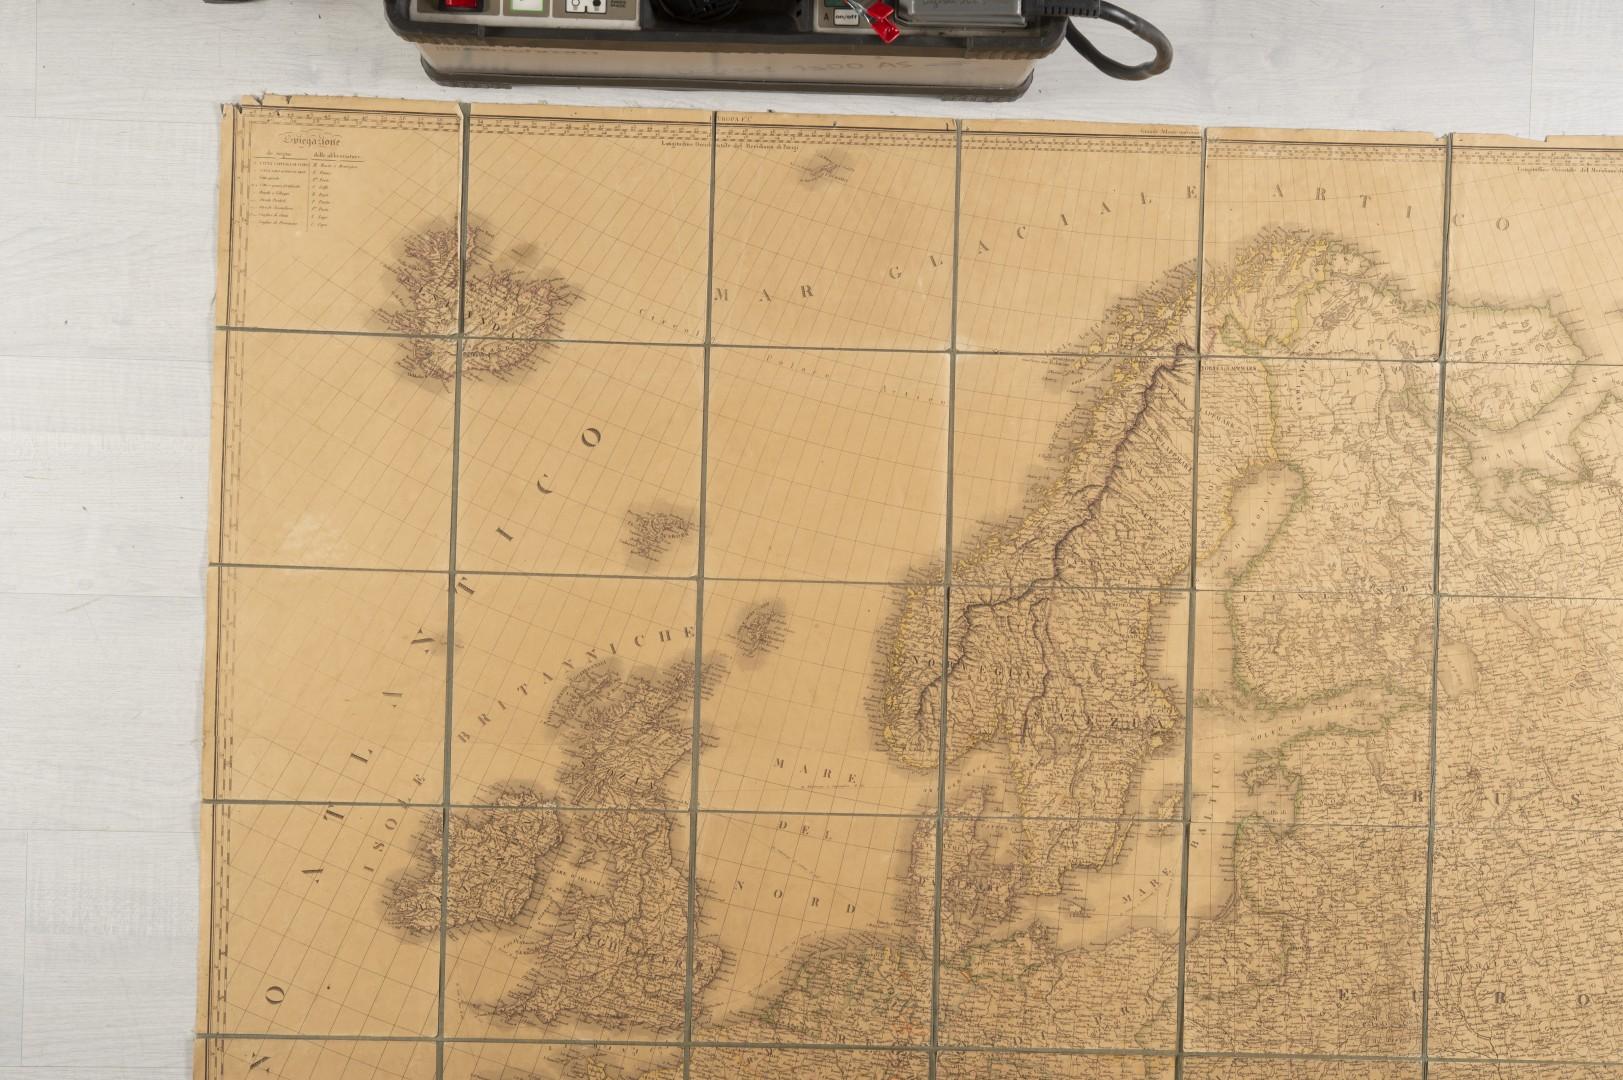 Stucchi, Stanislao Carta geografica statistica e stradale d'Europa. - Image 2 of 8